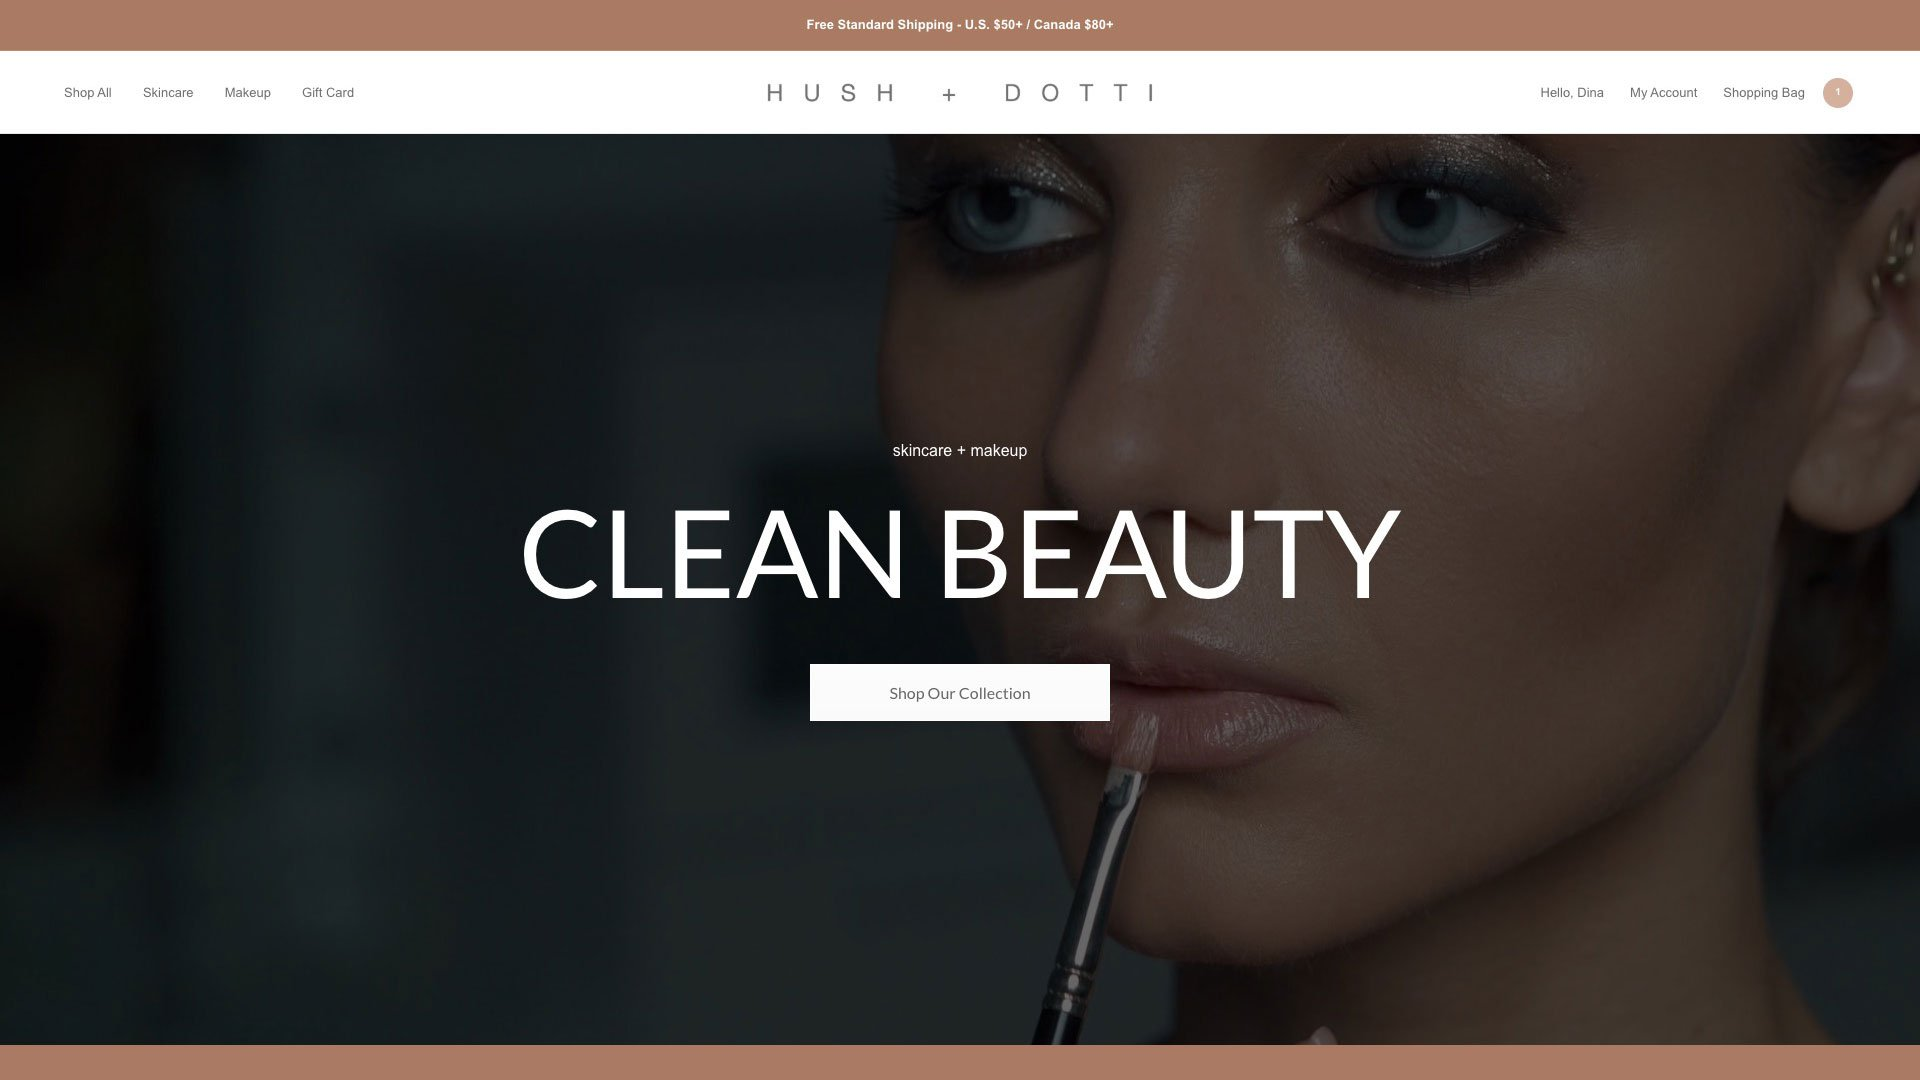 Hush + Dotti Website Main Page